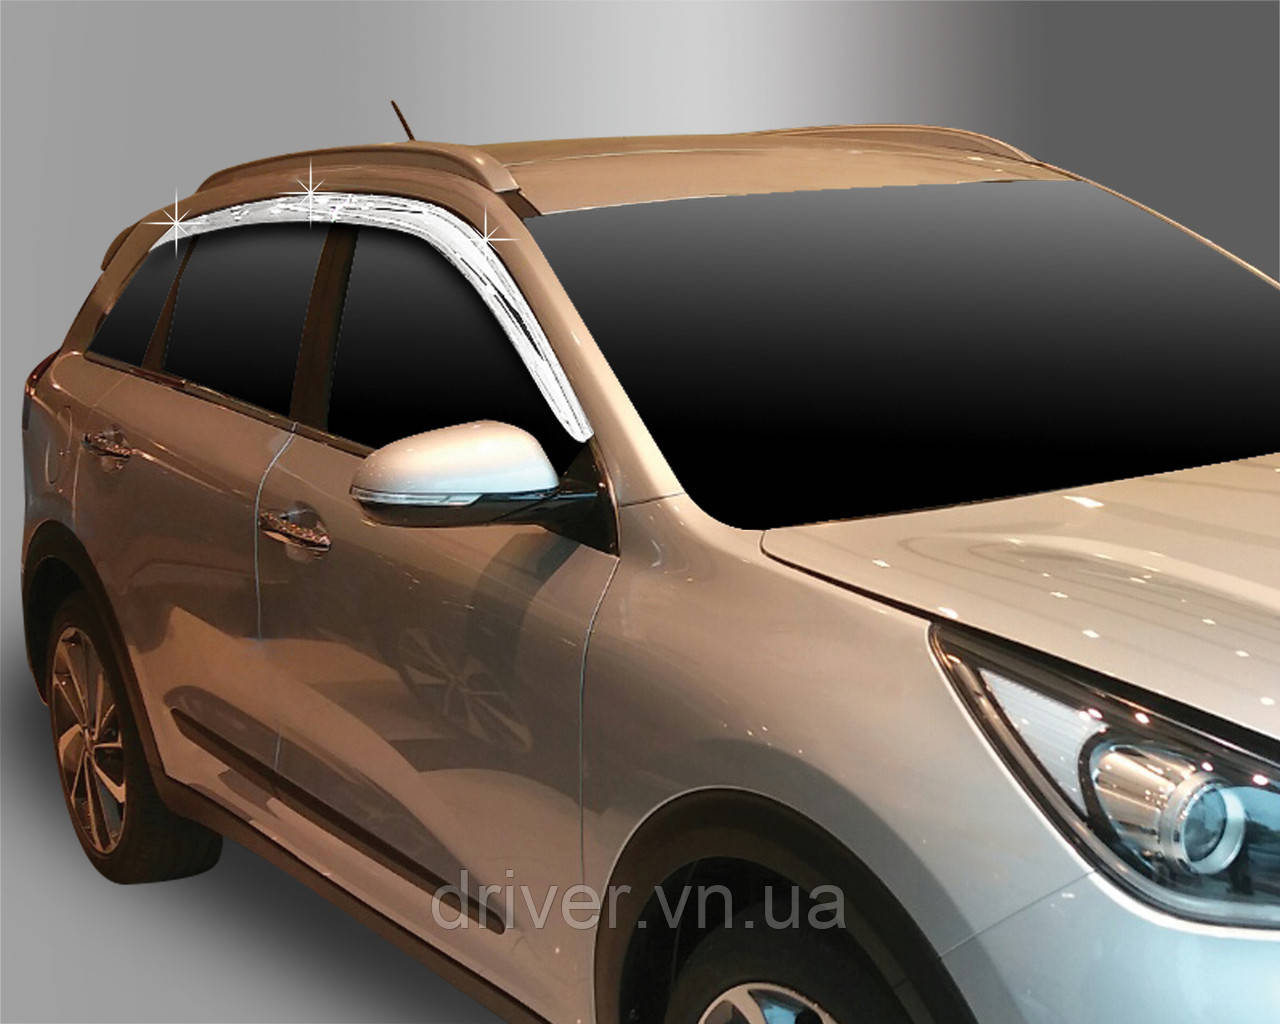 Kia Niro (2016-) Дефлектора окон хром 6шт